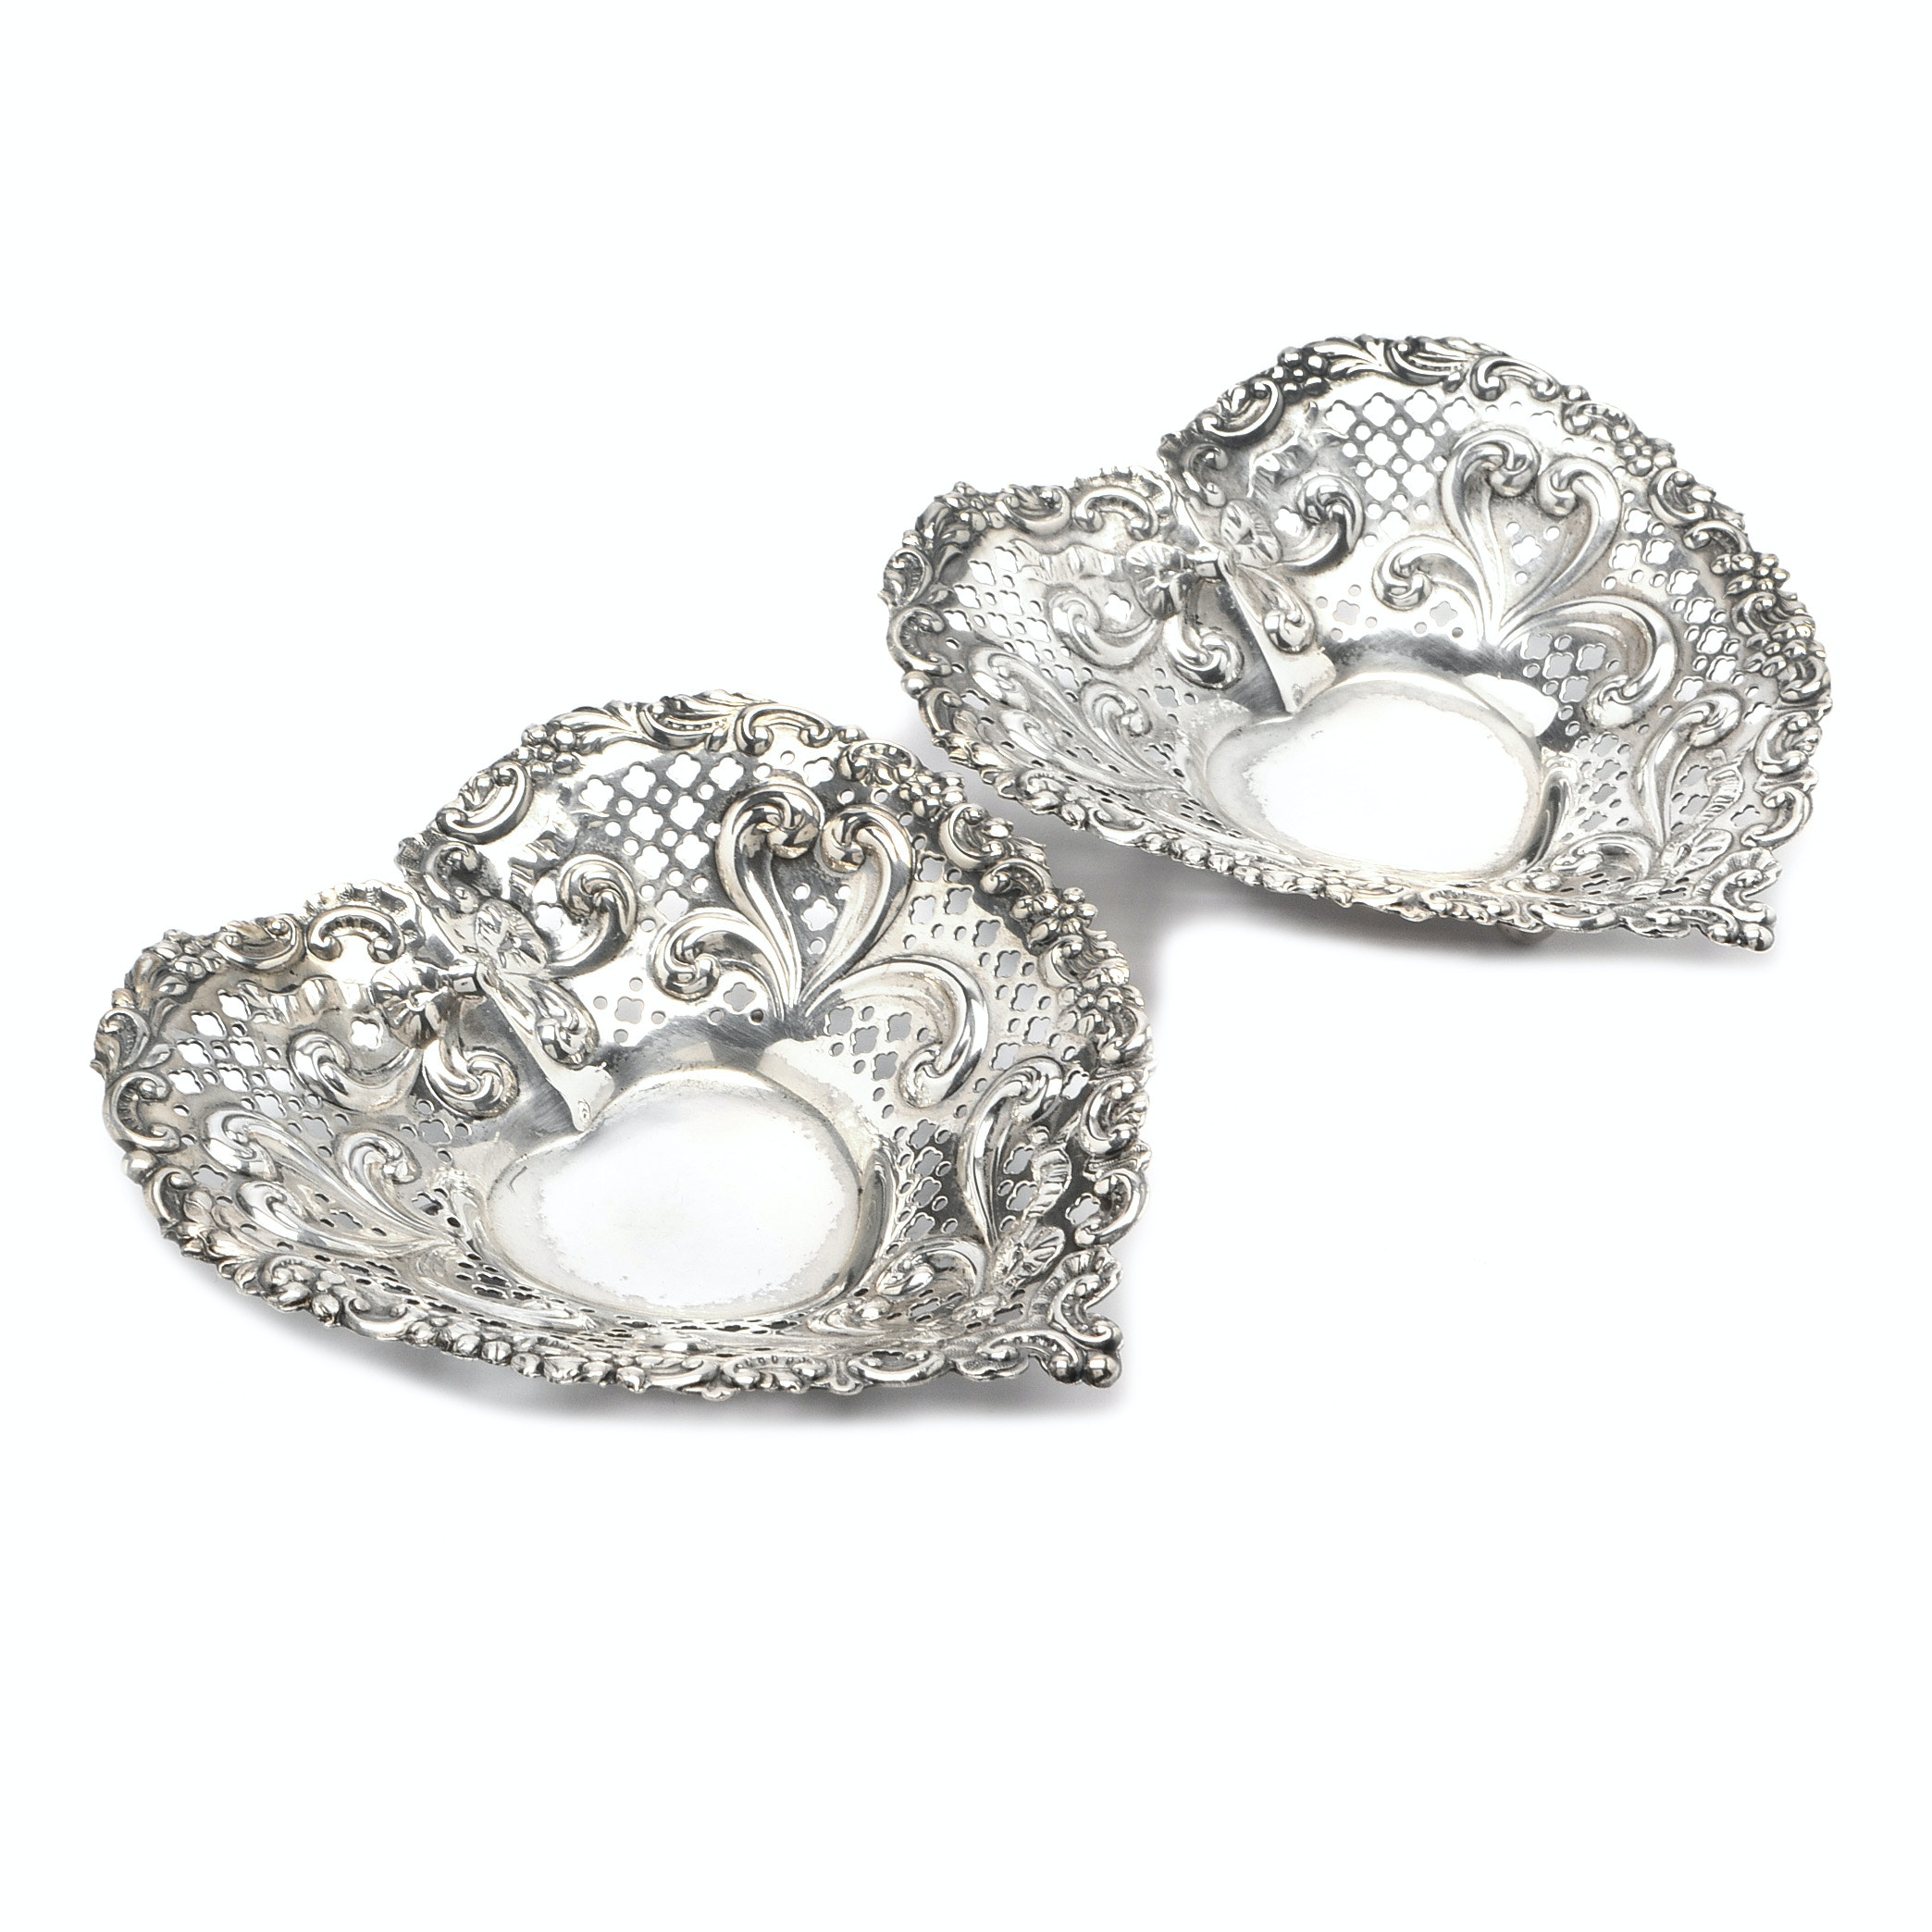 Gorham Sterling Silver Heart-Shaped Bowls